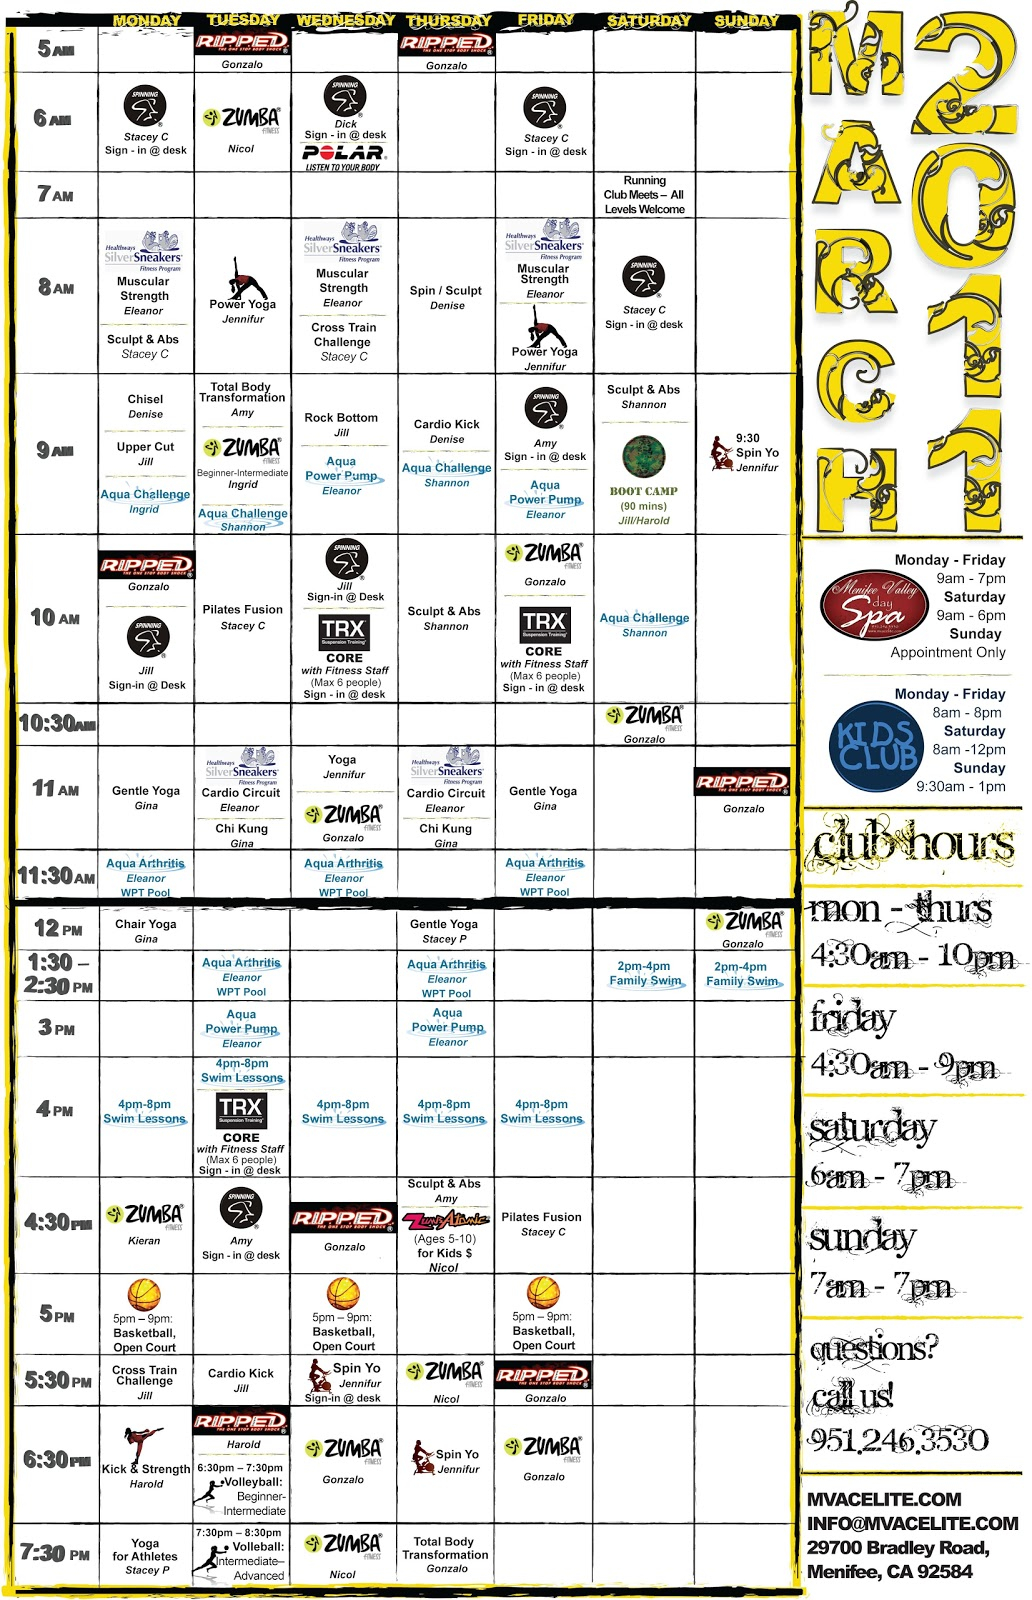 Menifee Valley Athletic Club Releases Its March 2011 Throughout Paloma High School Menifee Year School Calendar